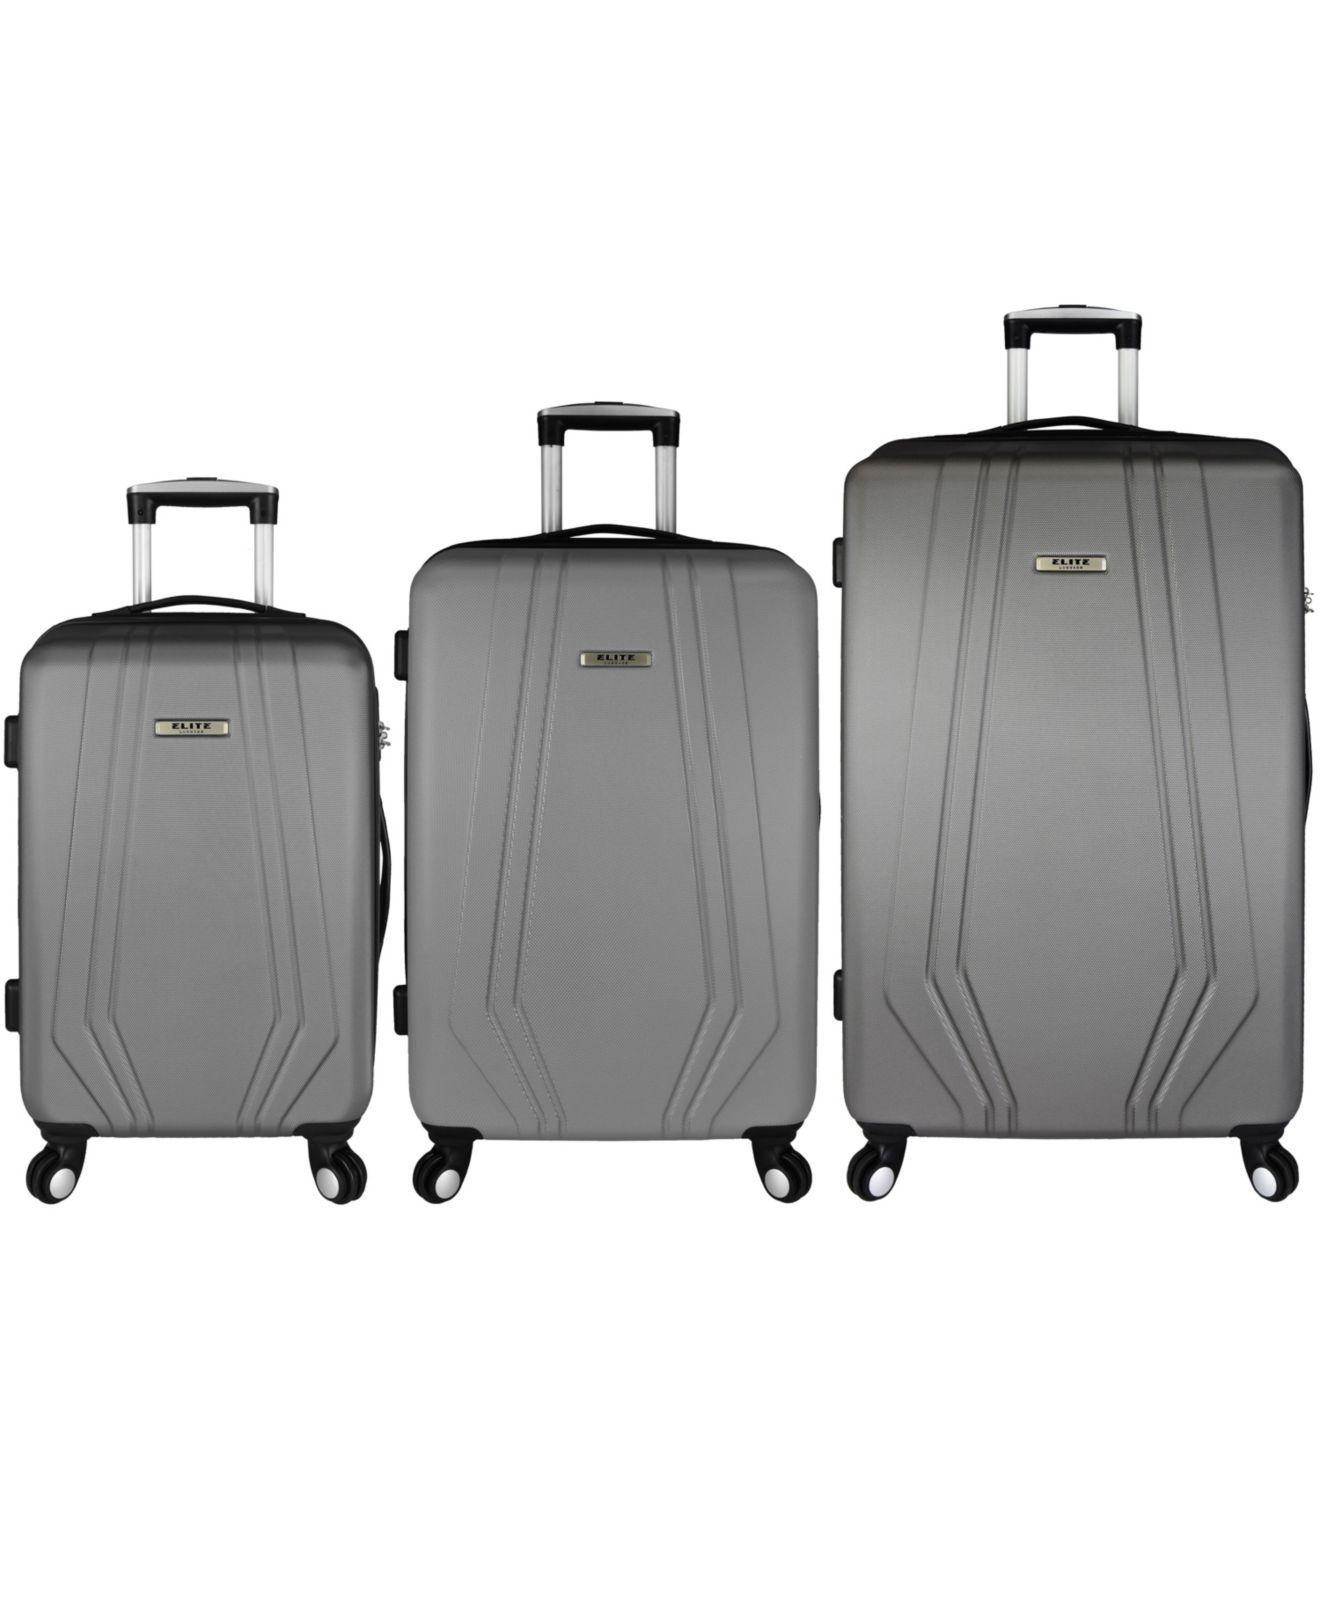 9bae8a8c3 Lyst - Elite Luggage Paris 3-piece Hardside Spinner Luggage Set in ...